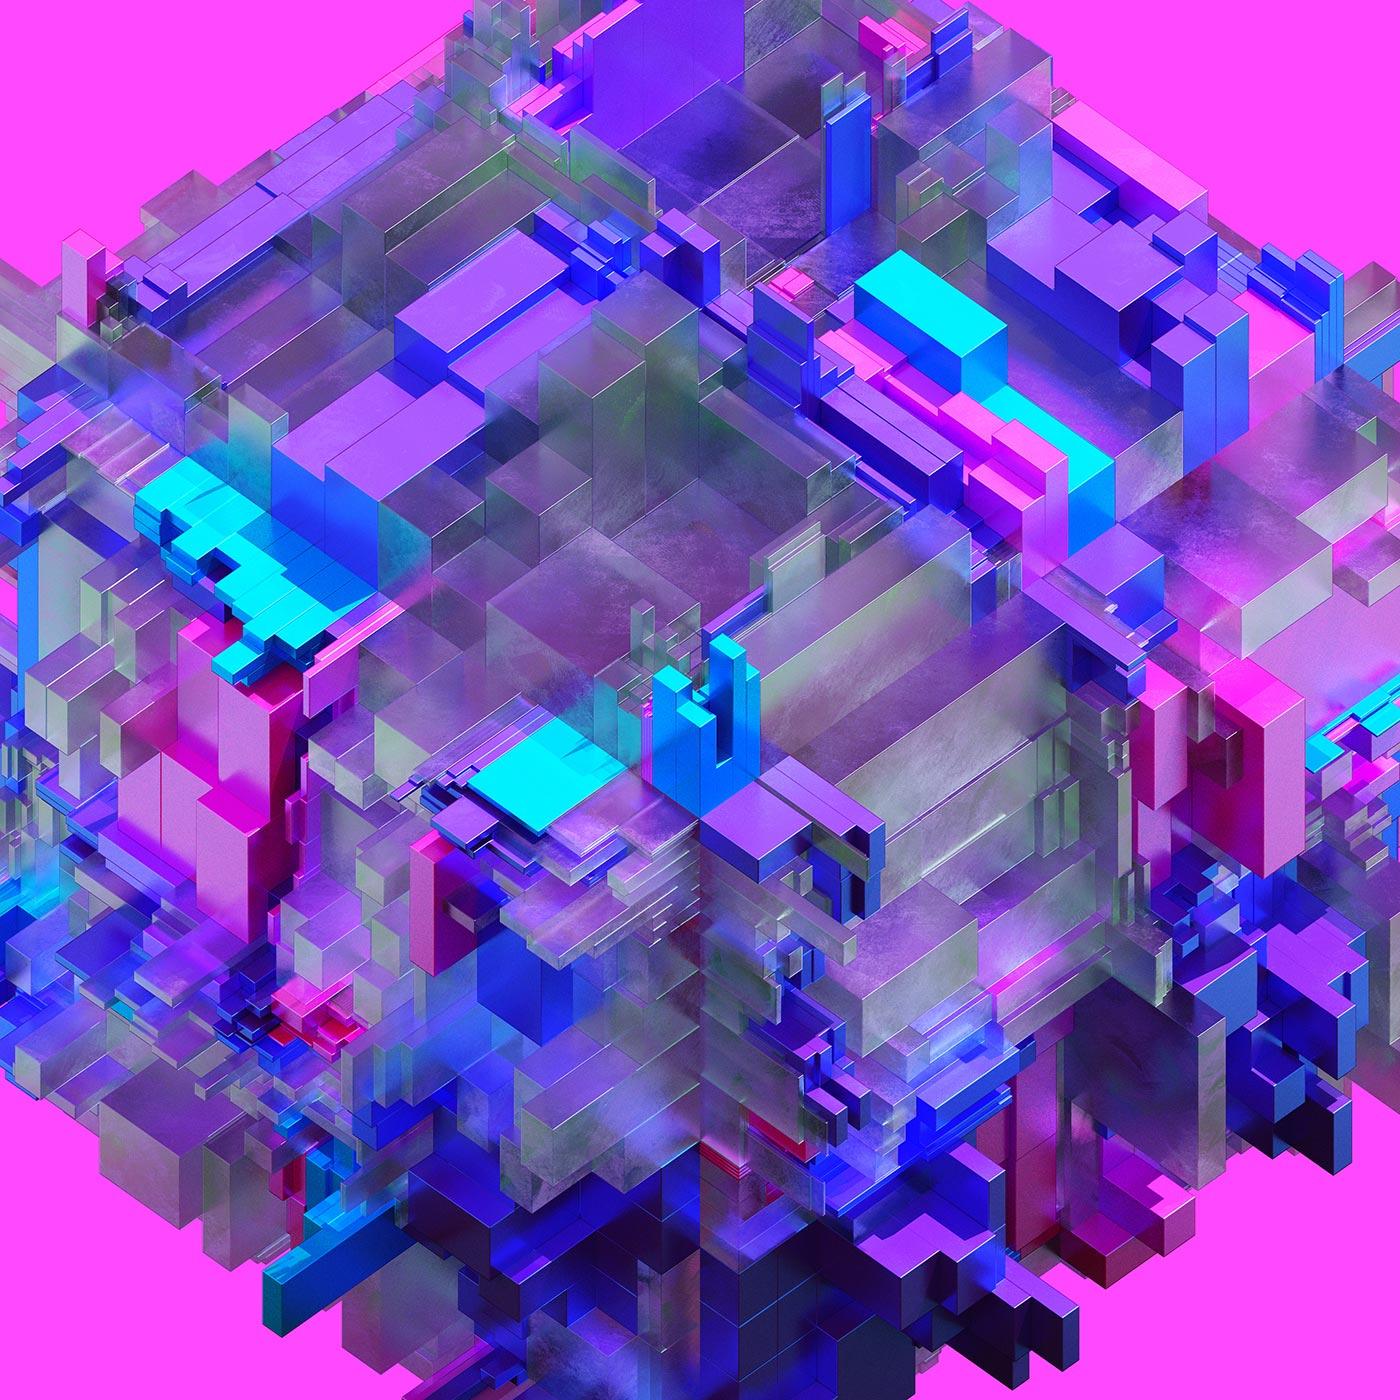 20200309_RS_HQ_4000x4000_CAM001_0002_print_1400px